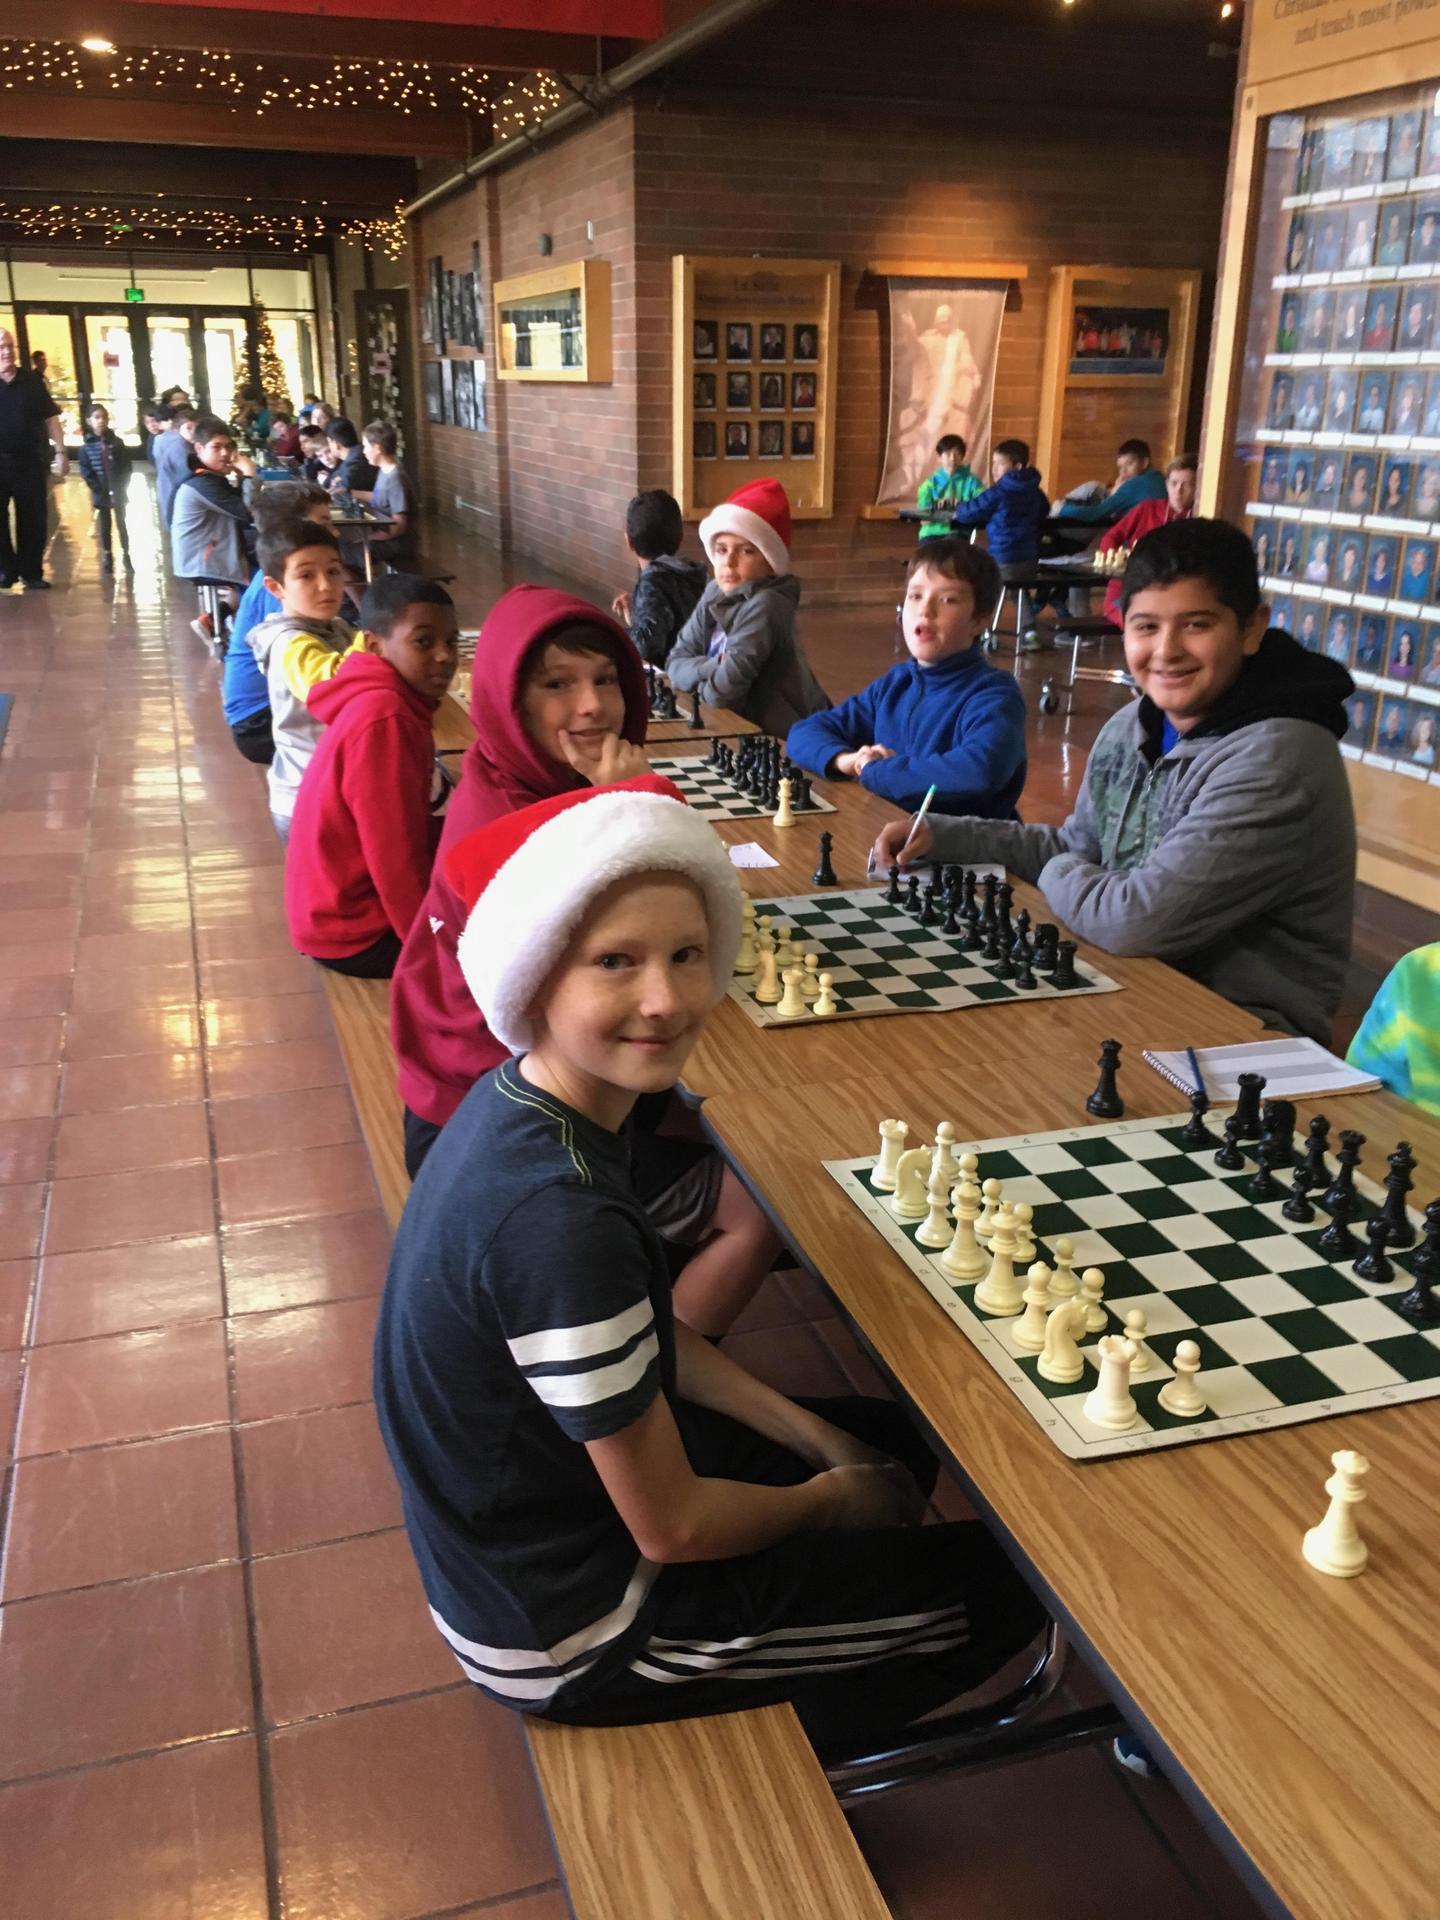 ab16edce 2018 Yuletide Tournament – Chess Club – La Salle Catholic College ...